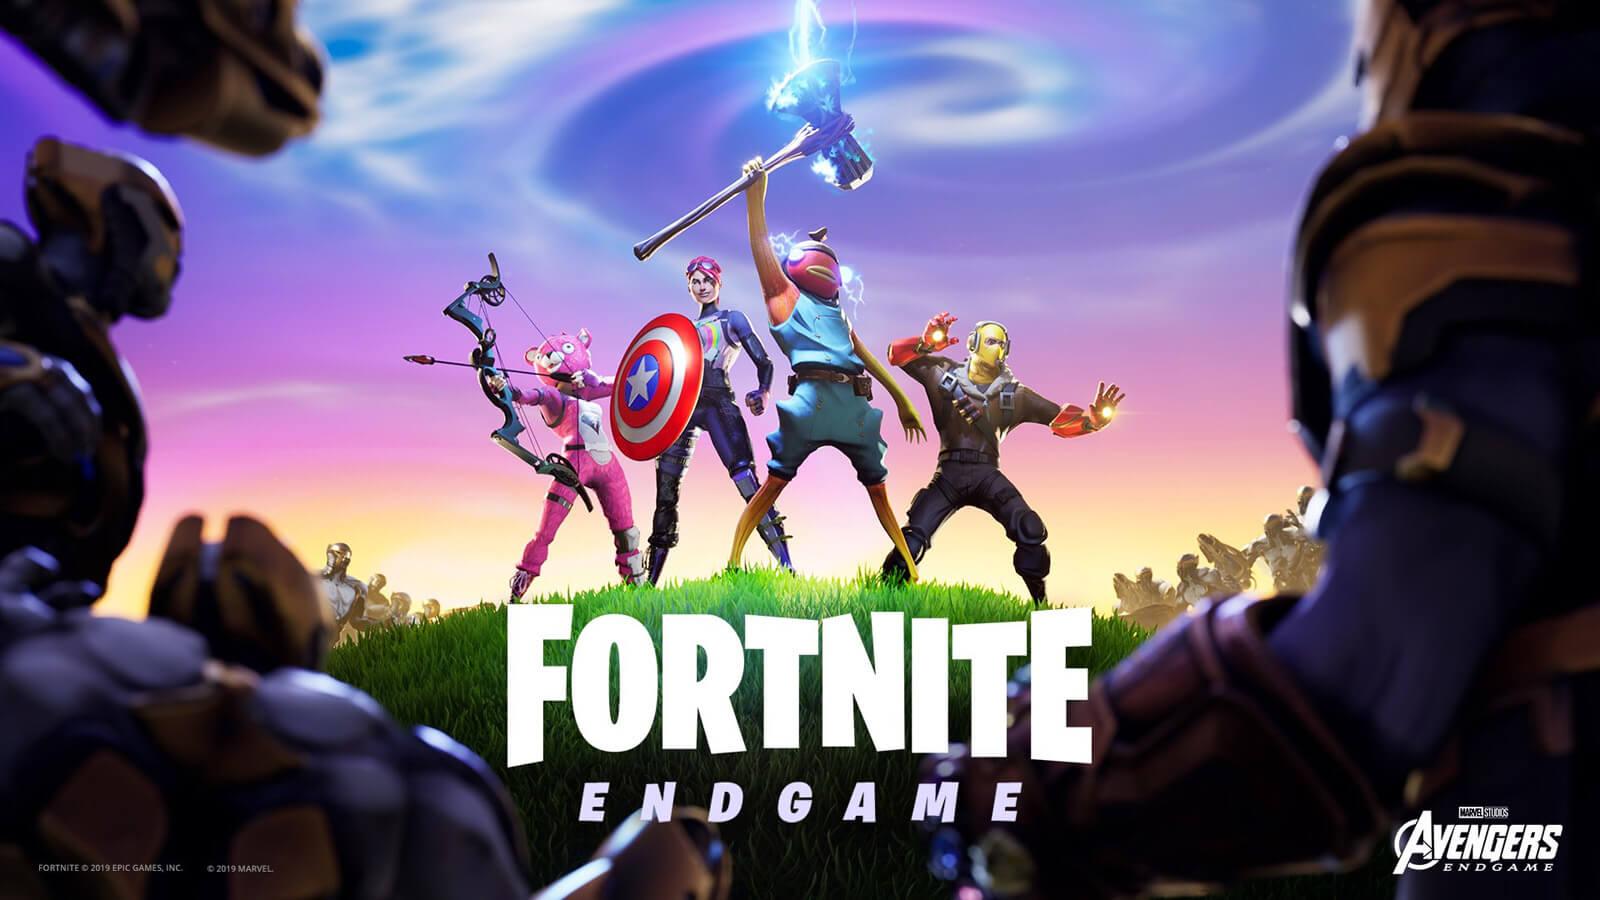 Fortnite X Avengers: Endgame Limited Time Mode - Gameslaught